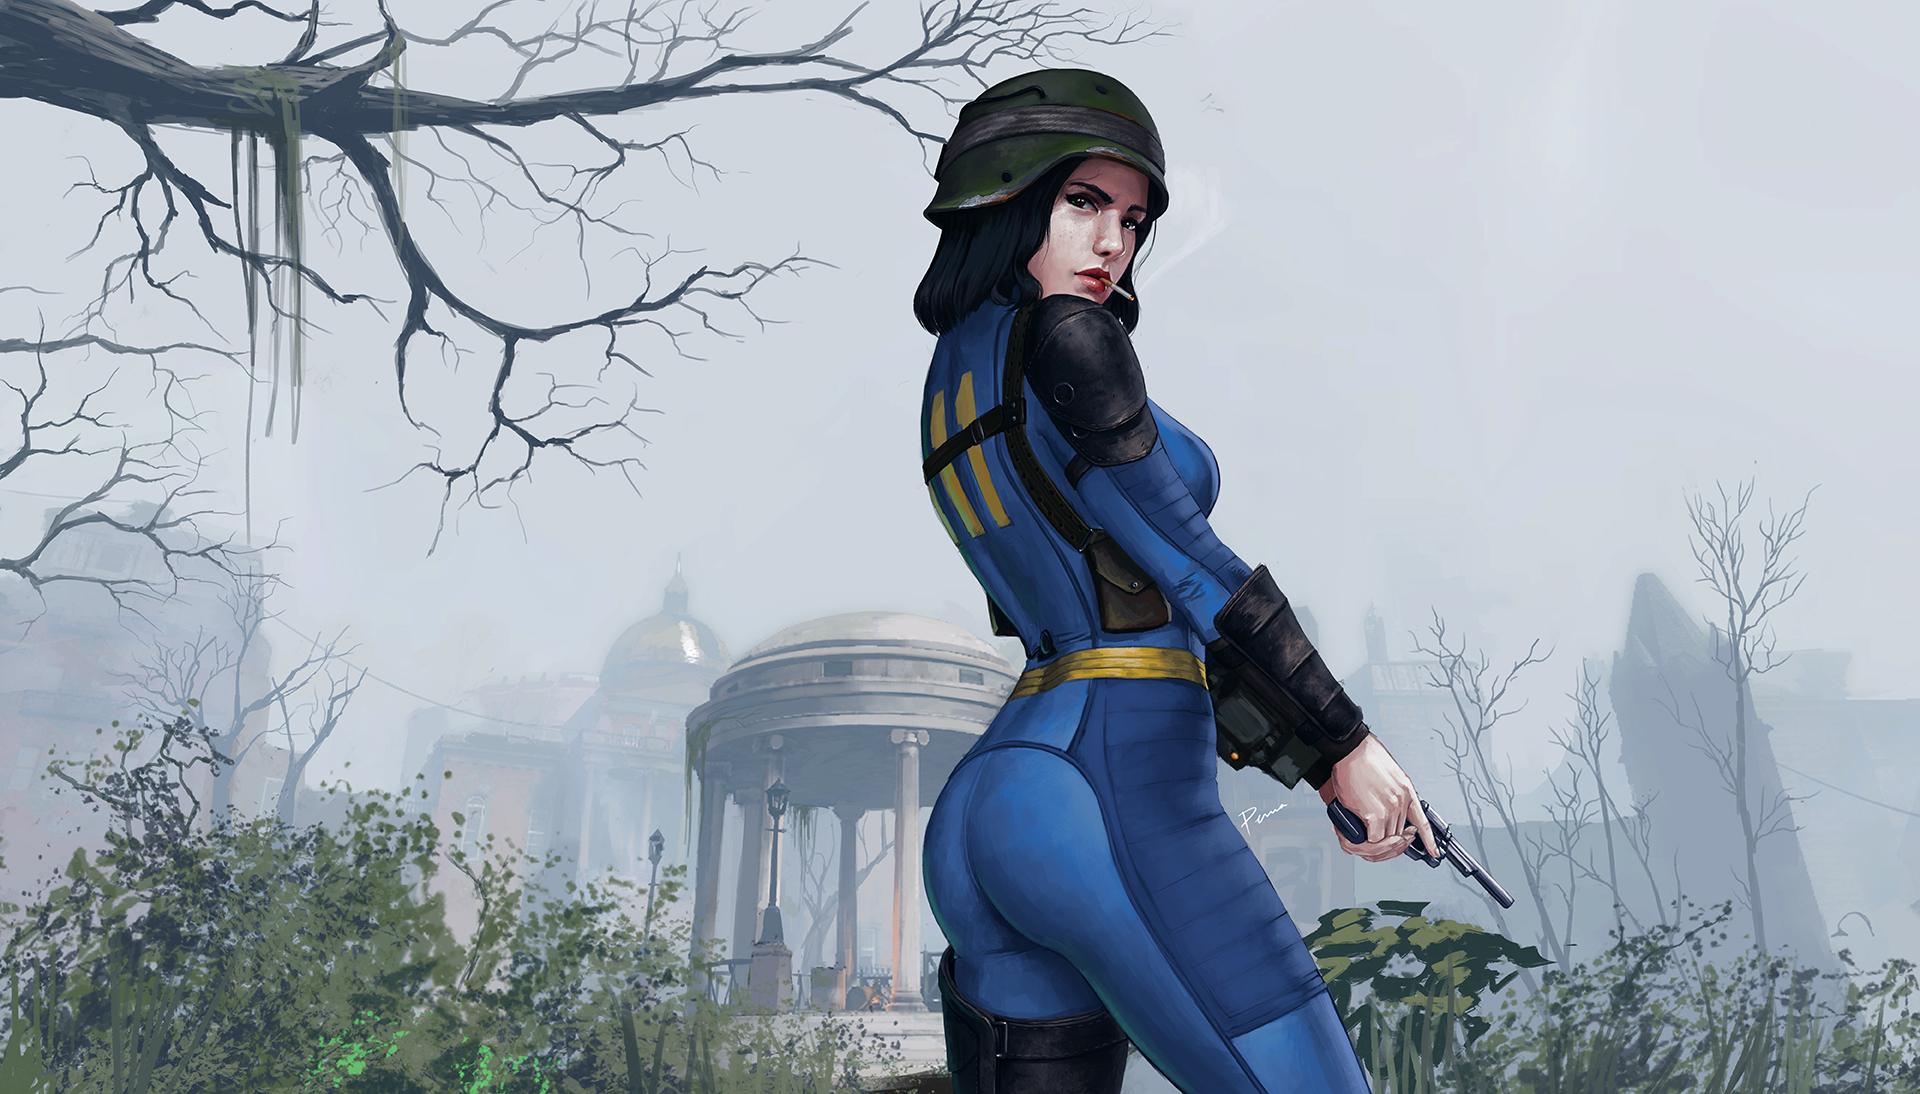 Sole Survivor Fallout 4 Artwork, HD Games, 4k Wallpapers ...